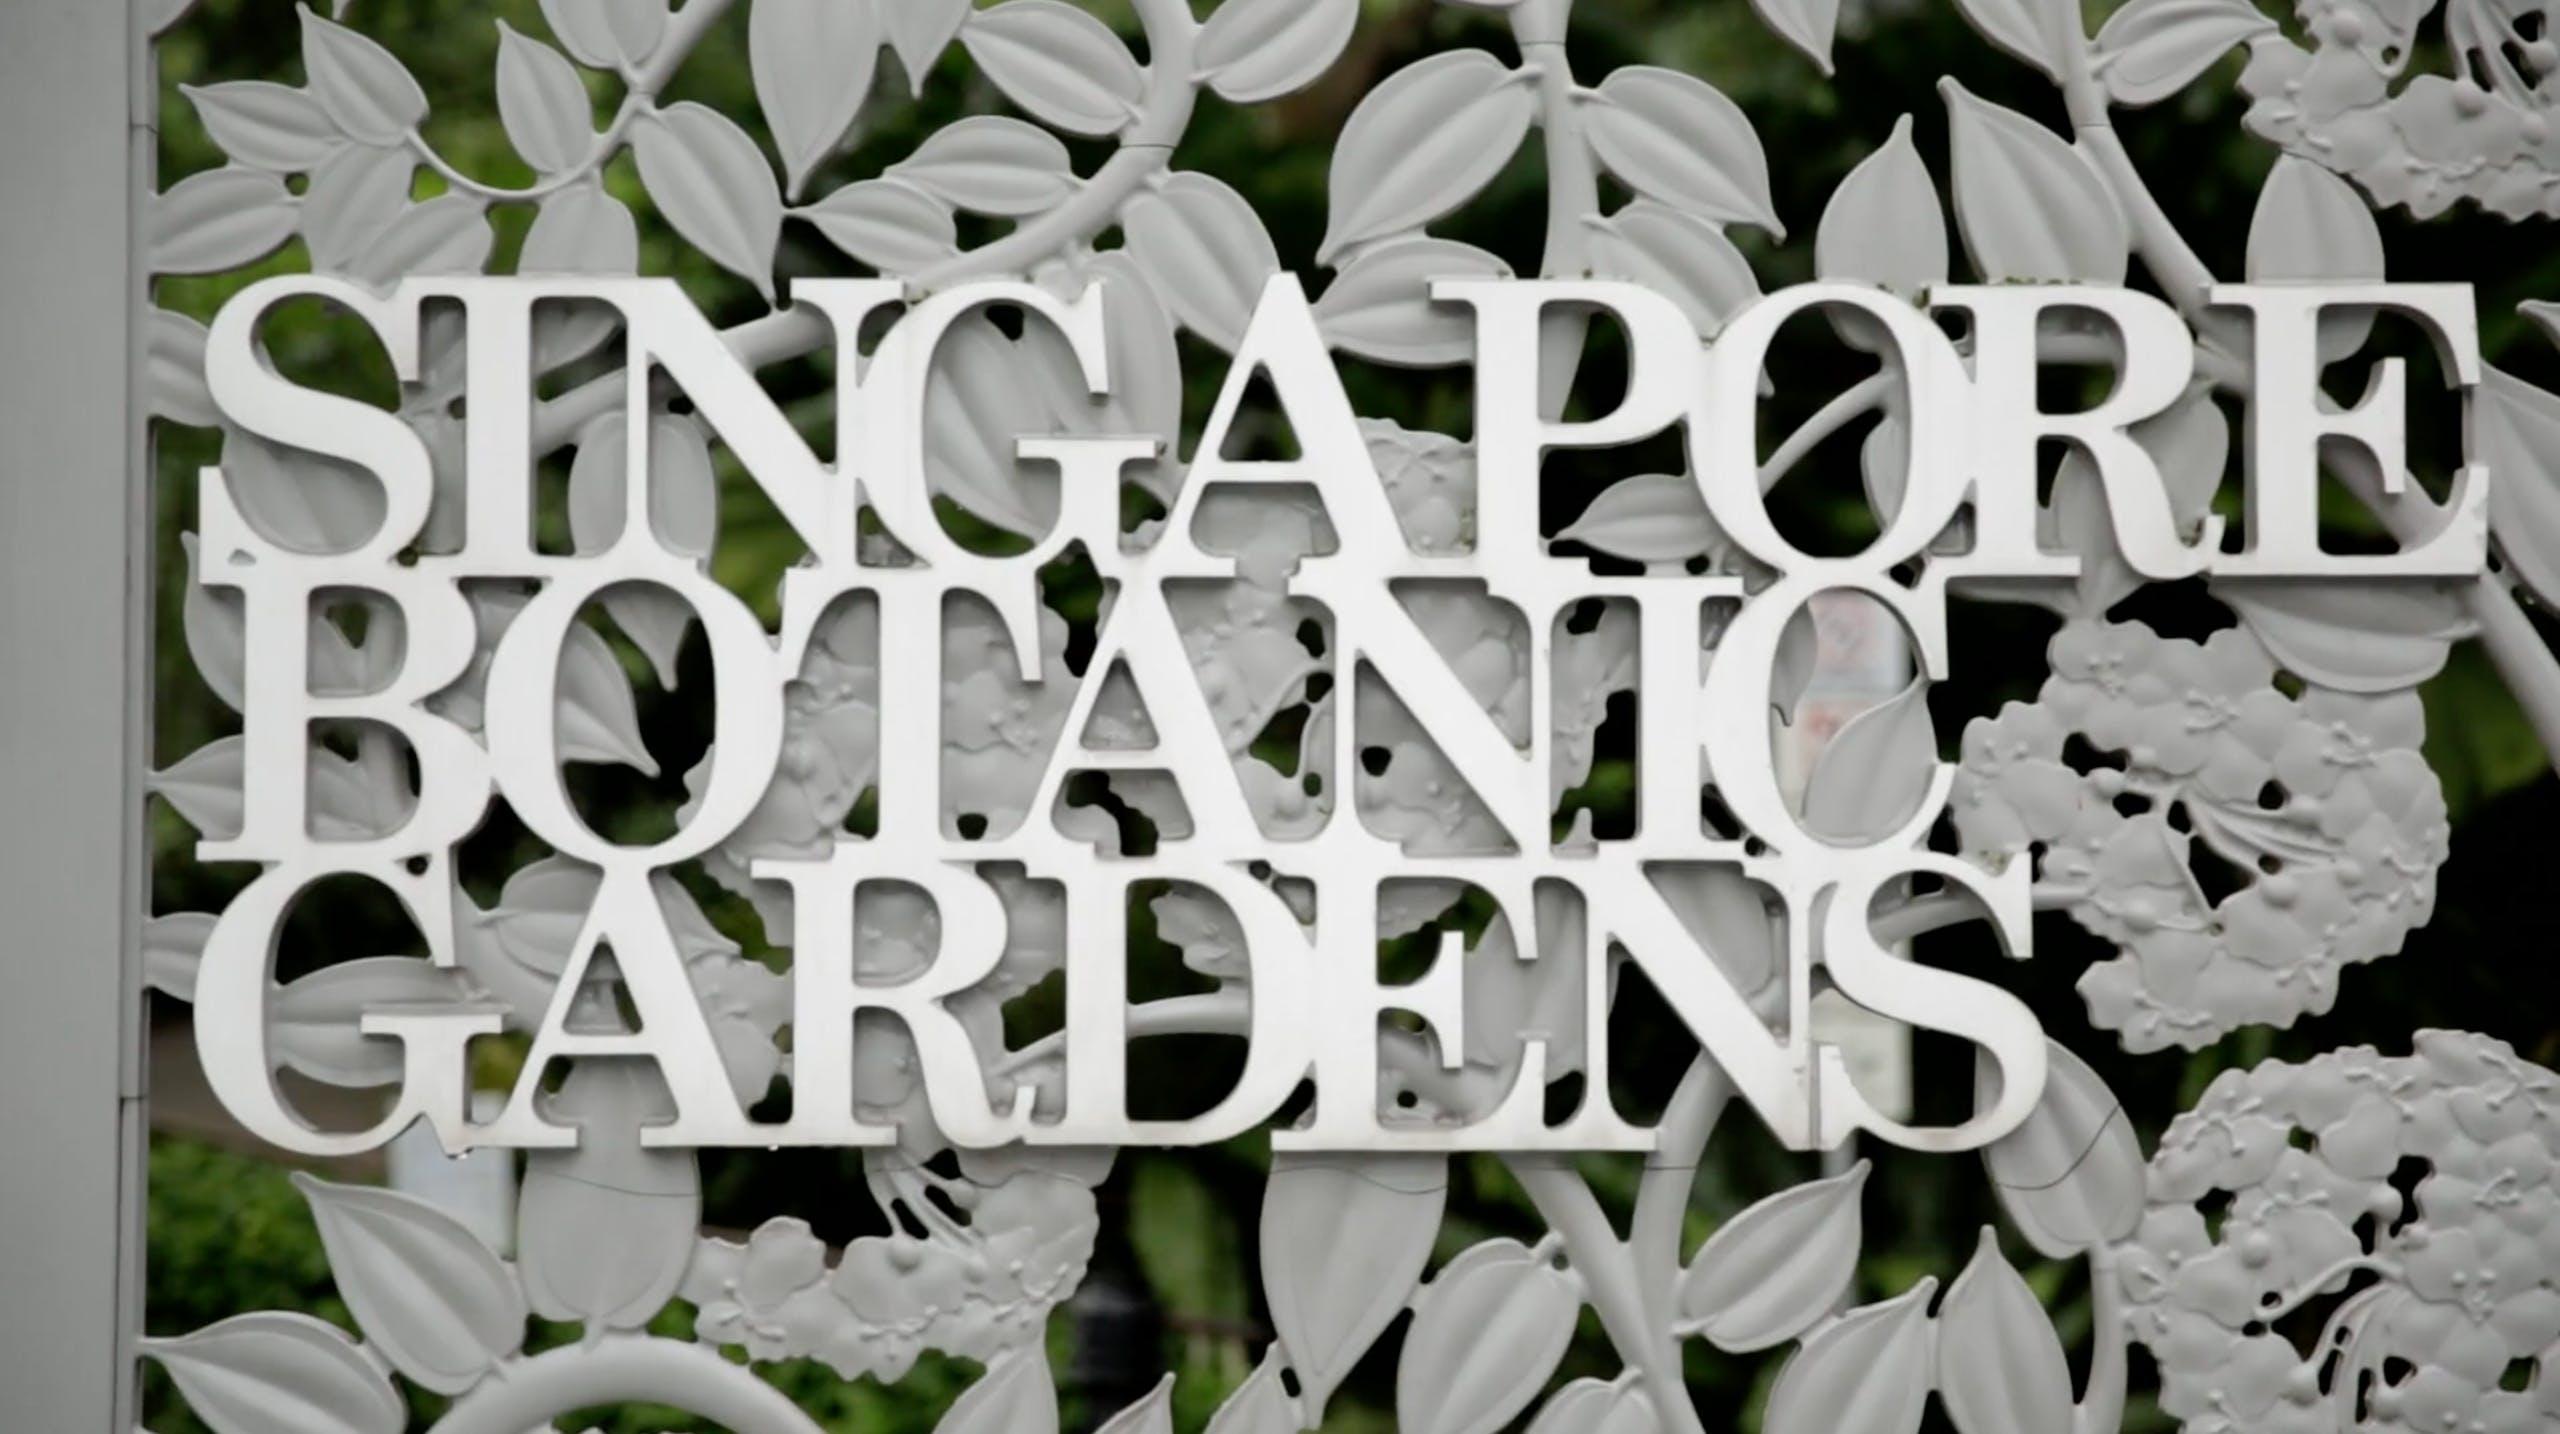 Singapore Botanic Gardens, UNESCO World Heritage Site National Parks Board